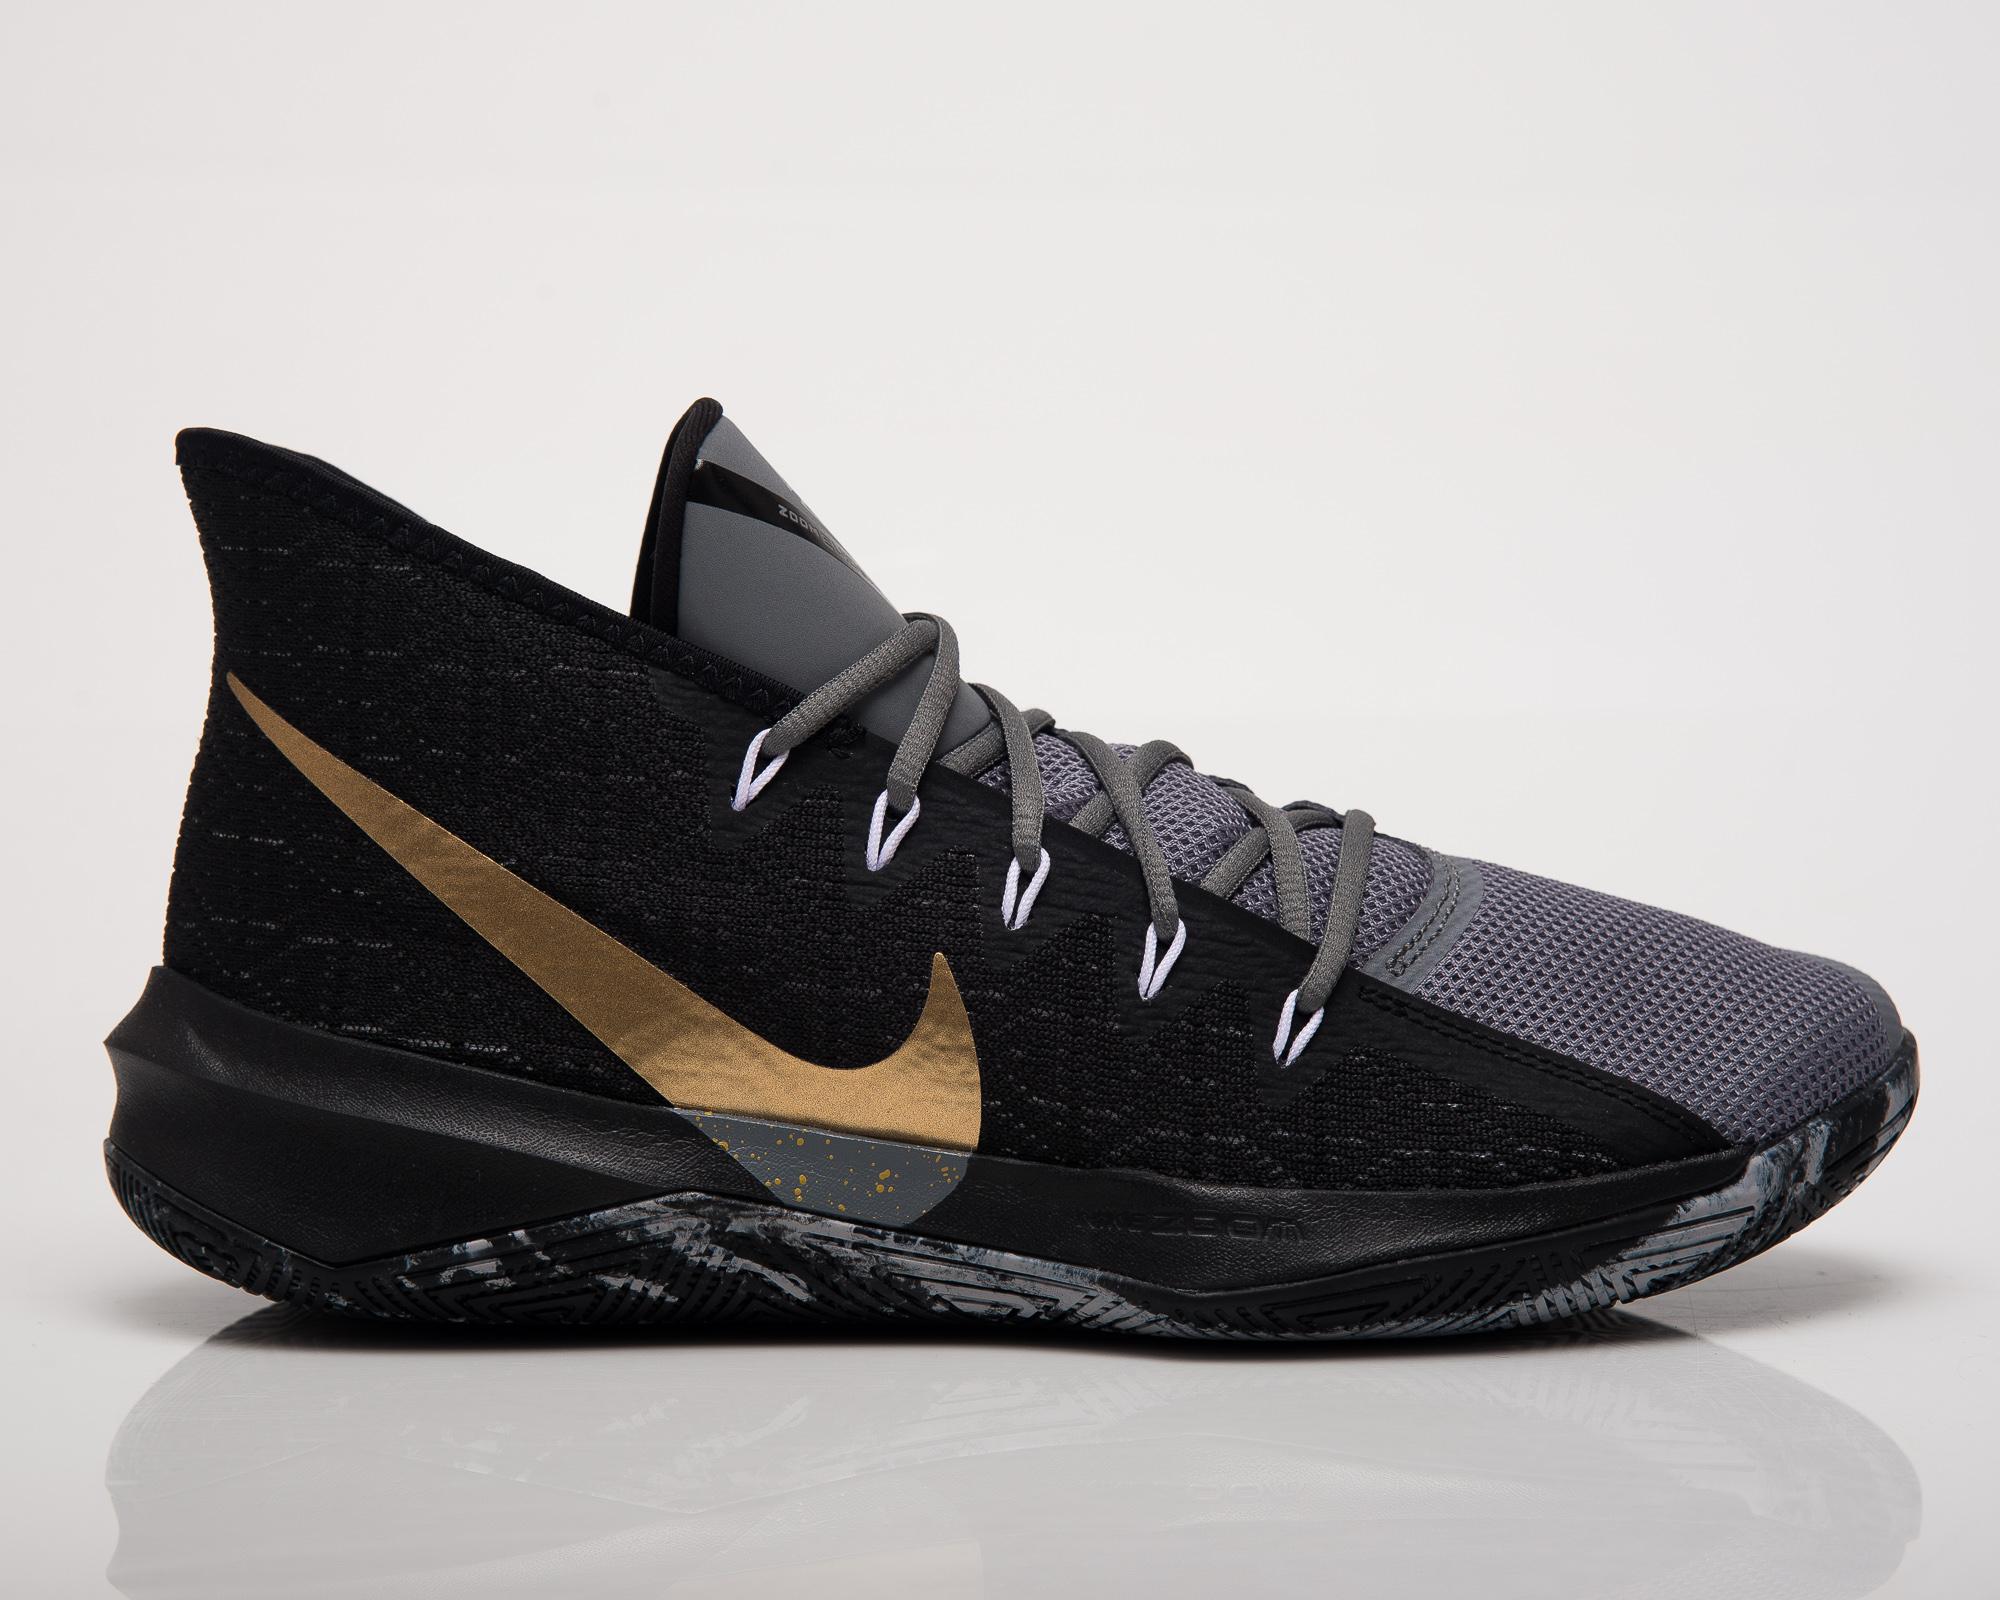 5b0567cfc05 Nike Zoom Evidence III - BASKETBALL SHOES NIKE Basketball Shoes -  Superfanas.lt